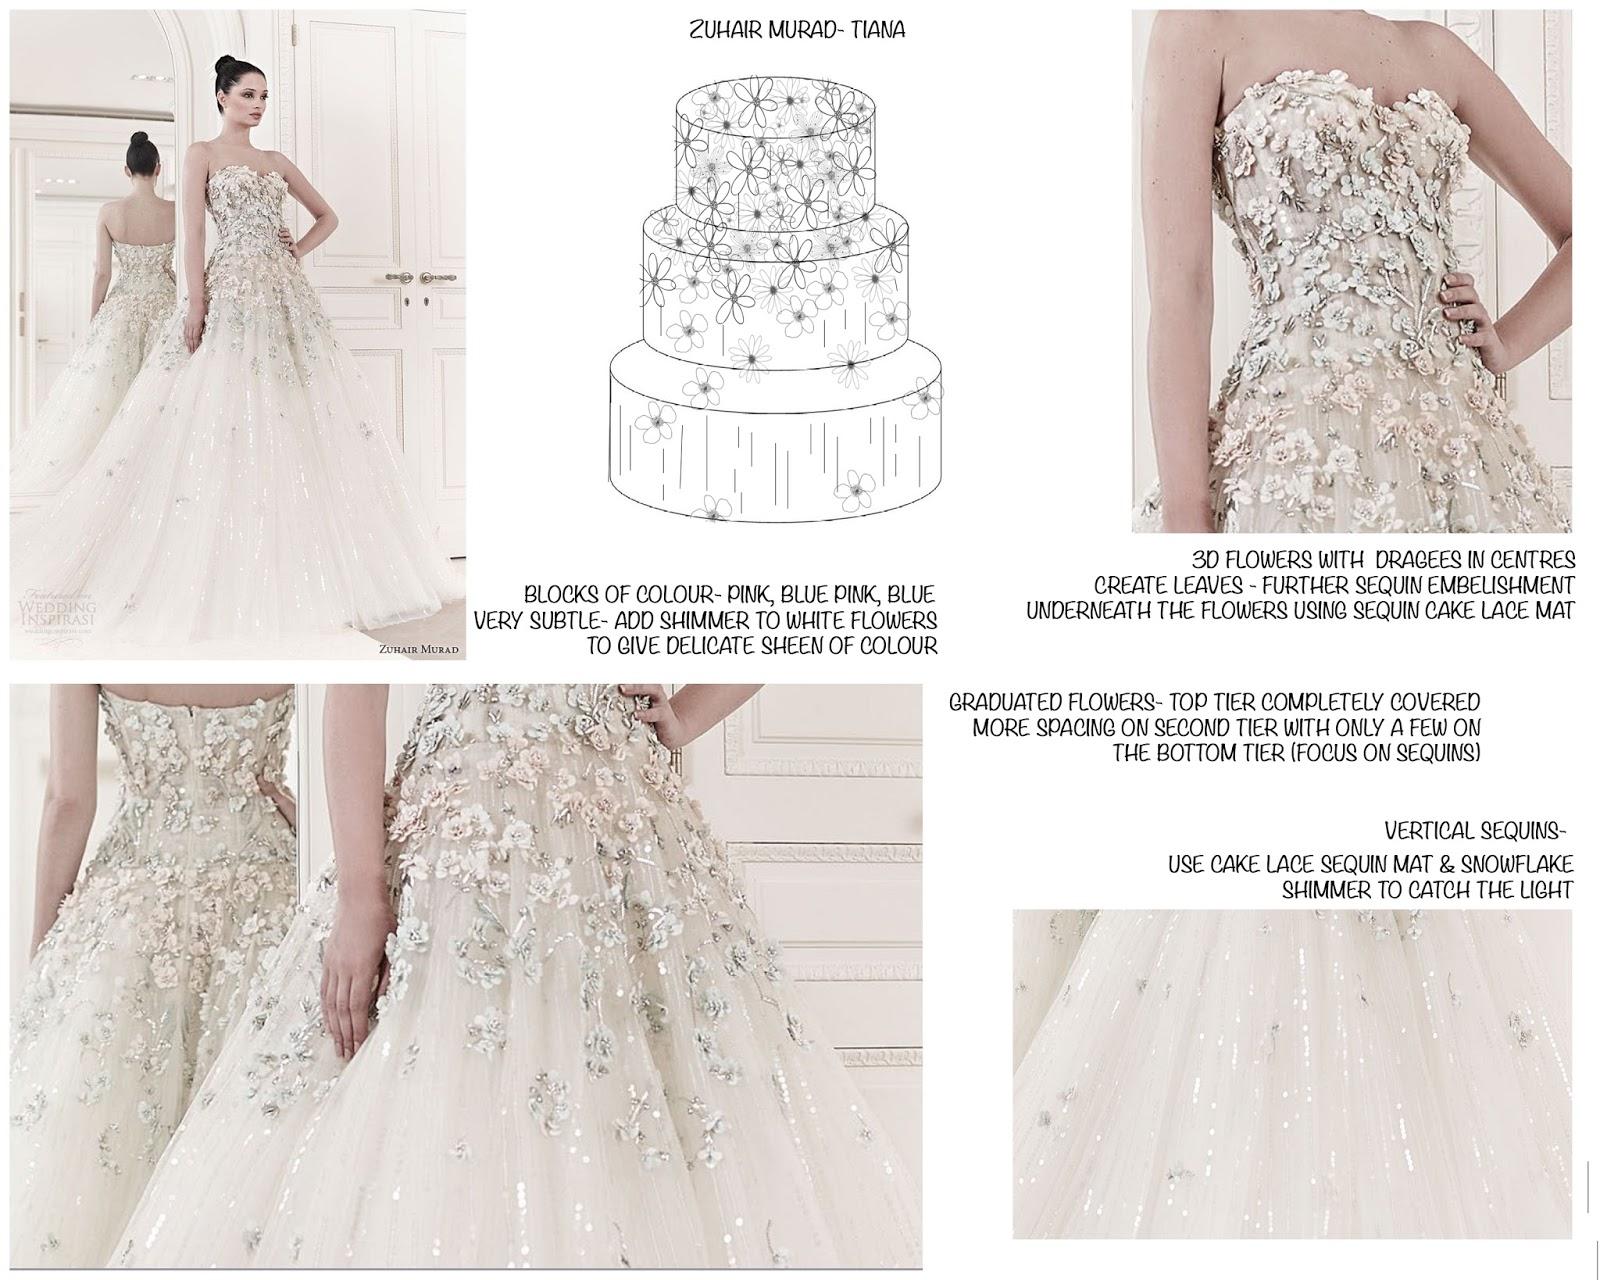 Wedding Cakes & Sugar Flowers-The fashion inspiration issue